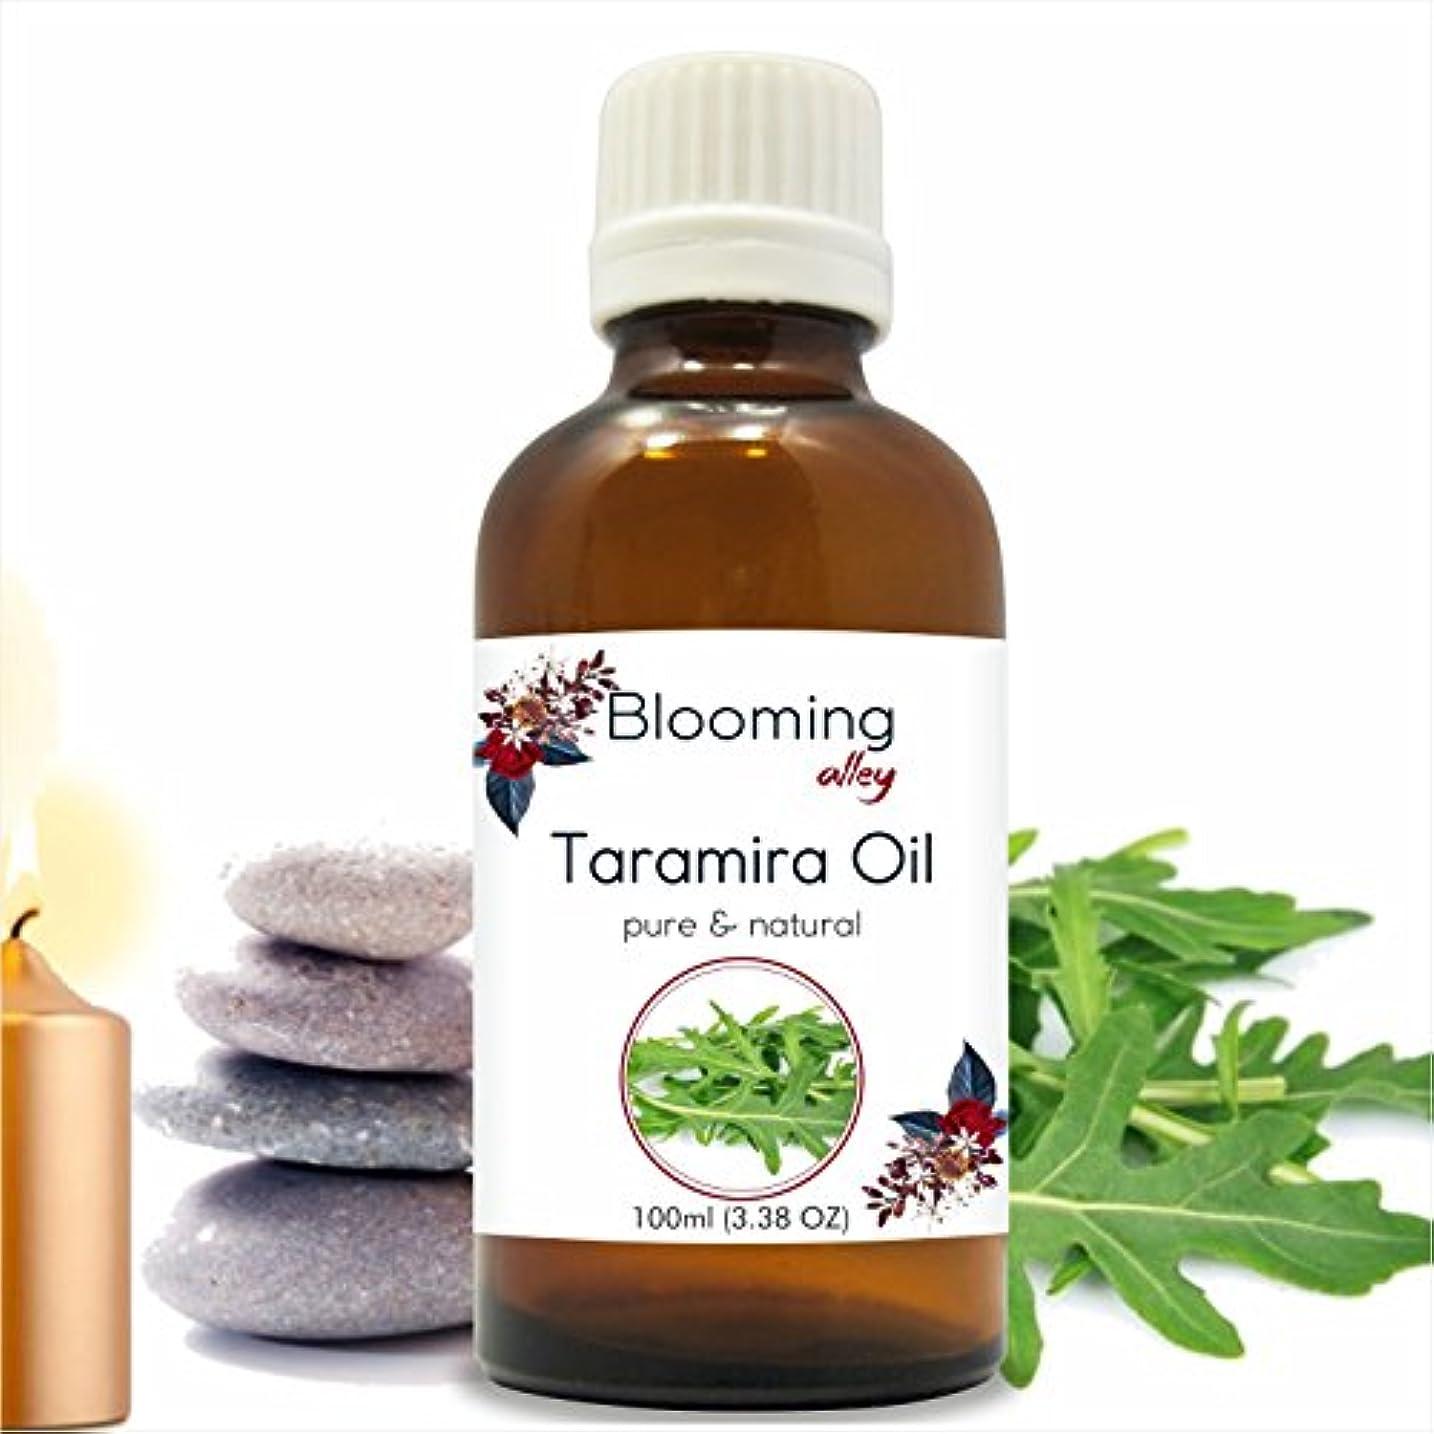 Taramira Oil(Eruca Sativa) Essential Oil 100 ml or 3.38 Fl Oz by Blooming Alley